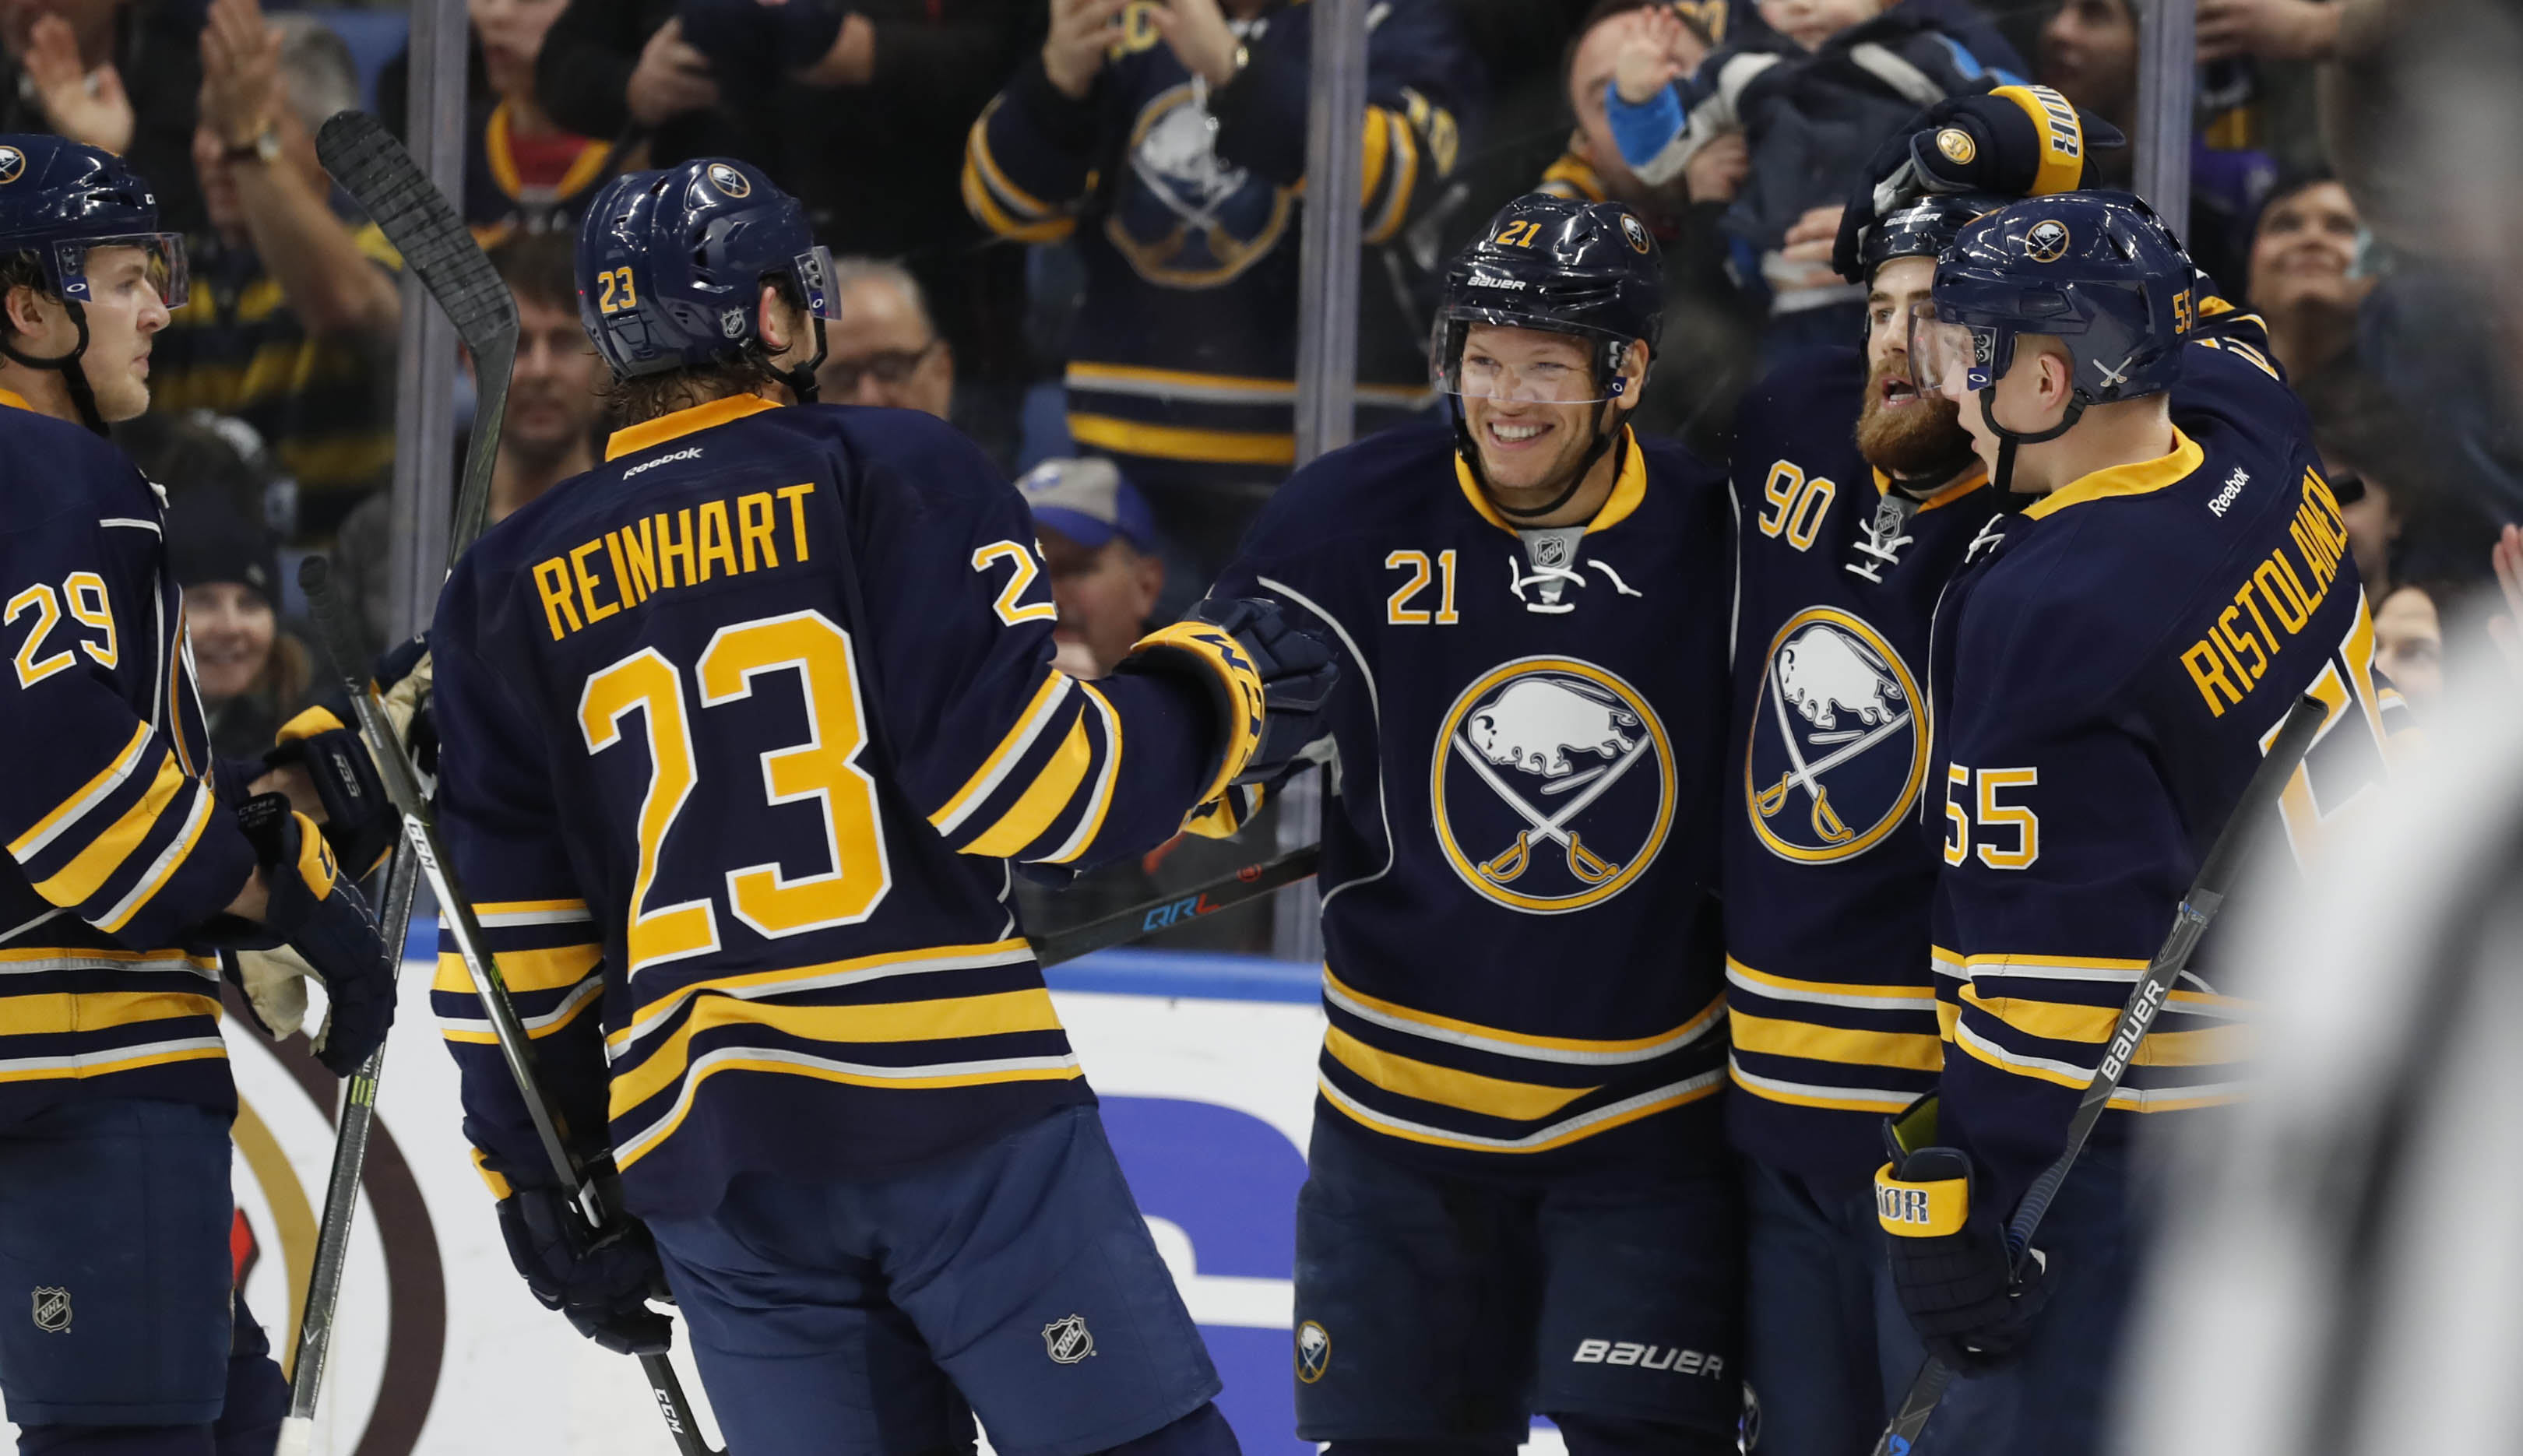 Sam Reinhart, Kyle Okposo (21), Ryan O'Reilly and Rasmus Ristolainen all reached the score sheet Tuesday. (Harry Scull Jr./Buffalo News)